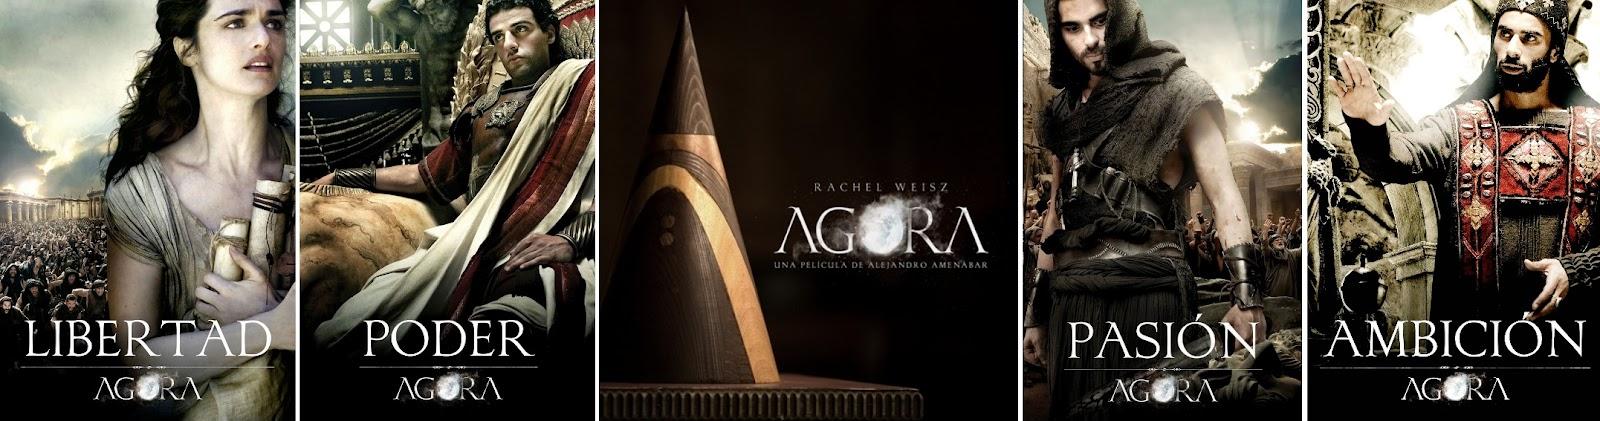 Ágora-lemas-1.jpg